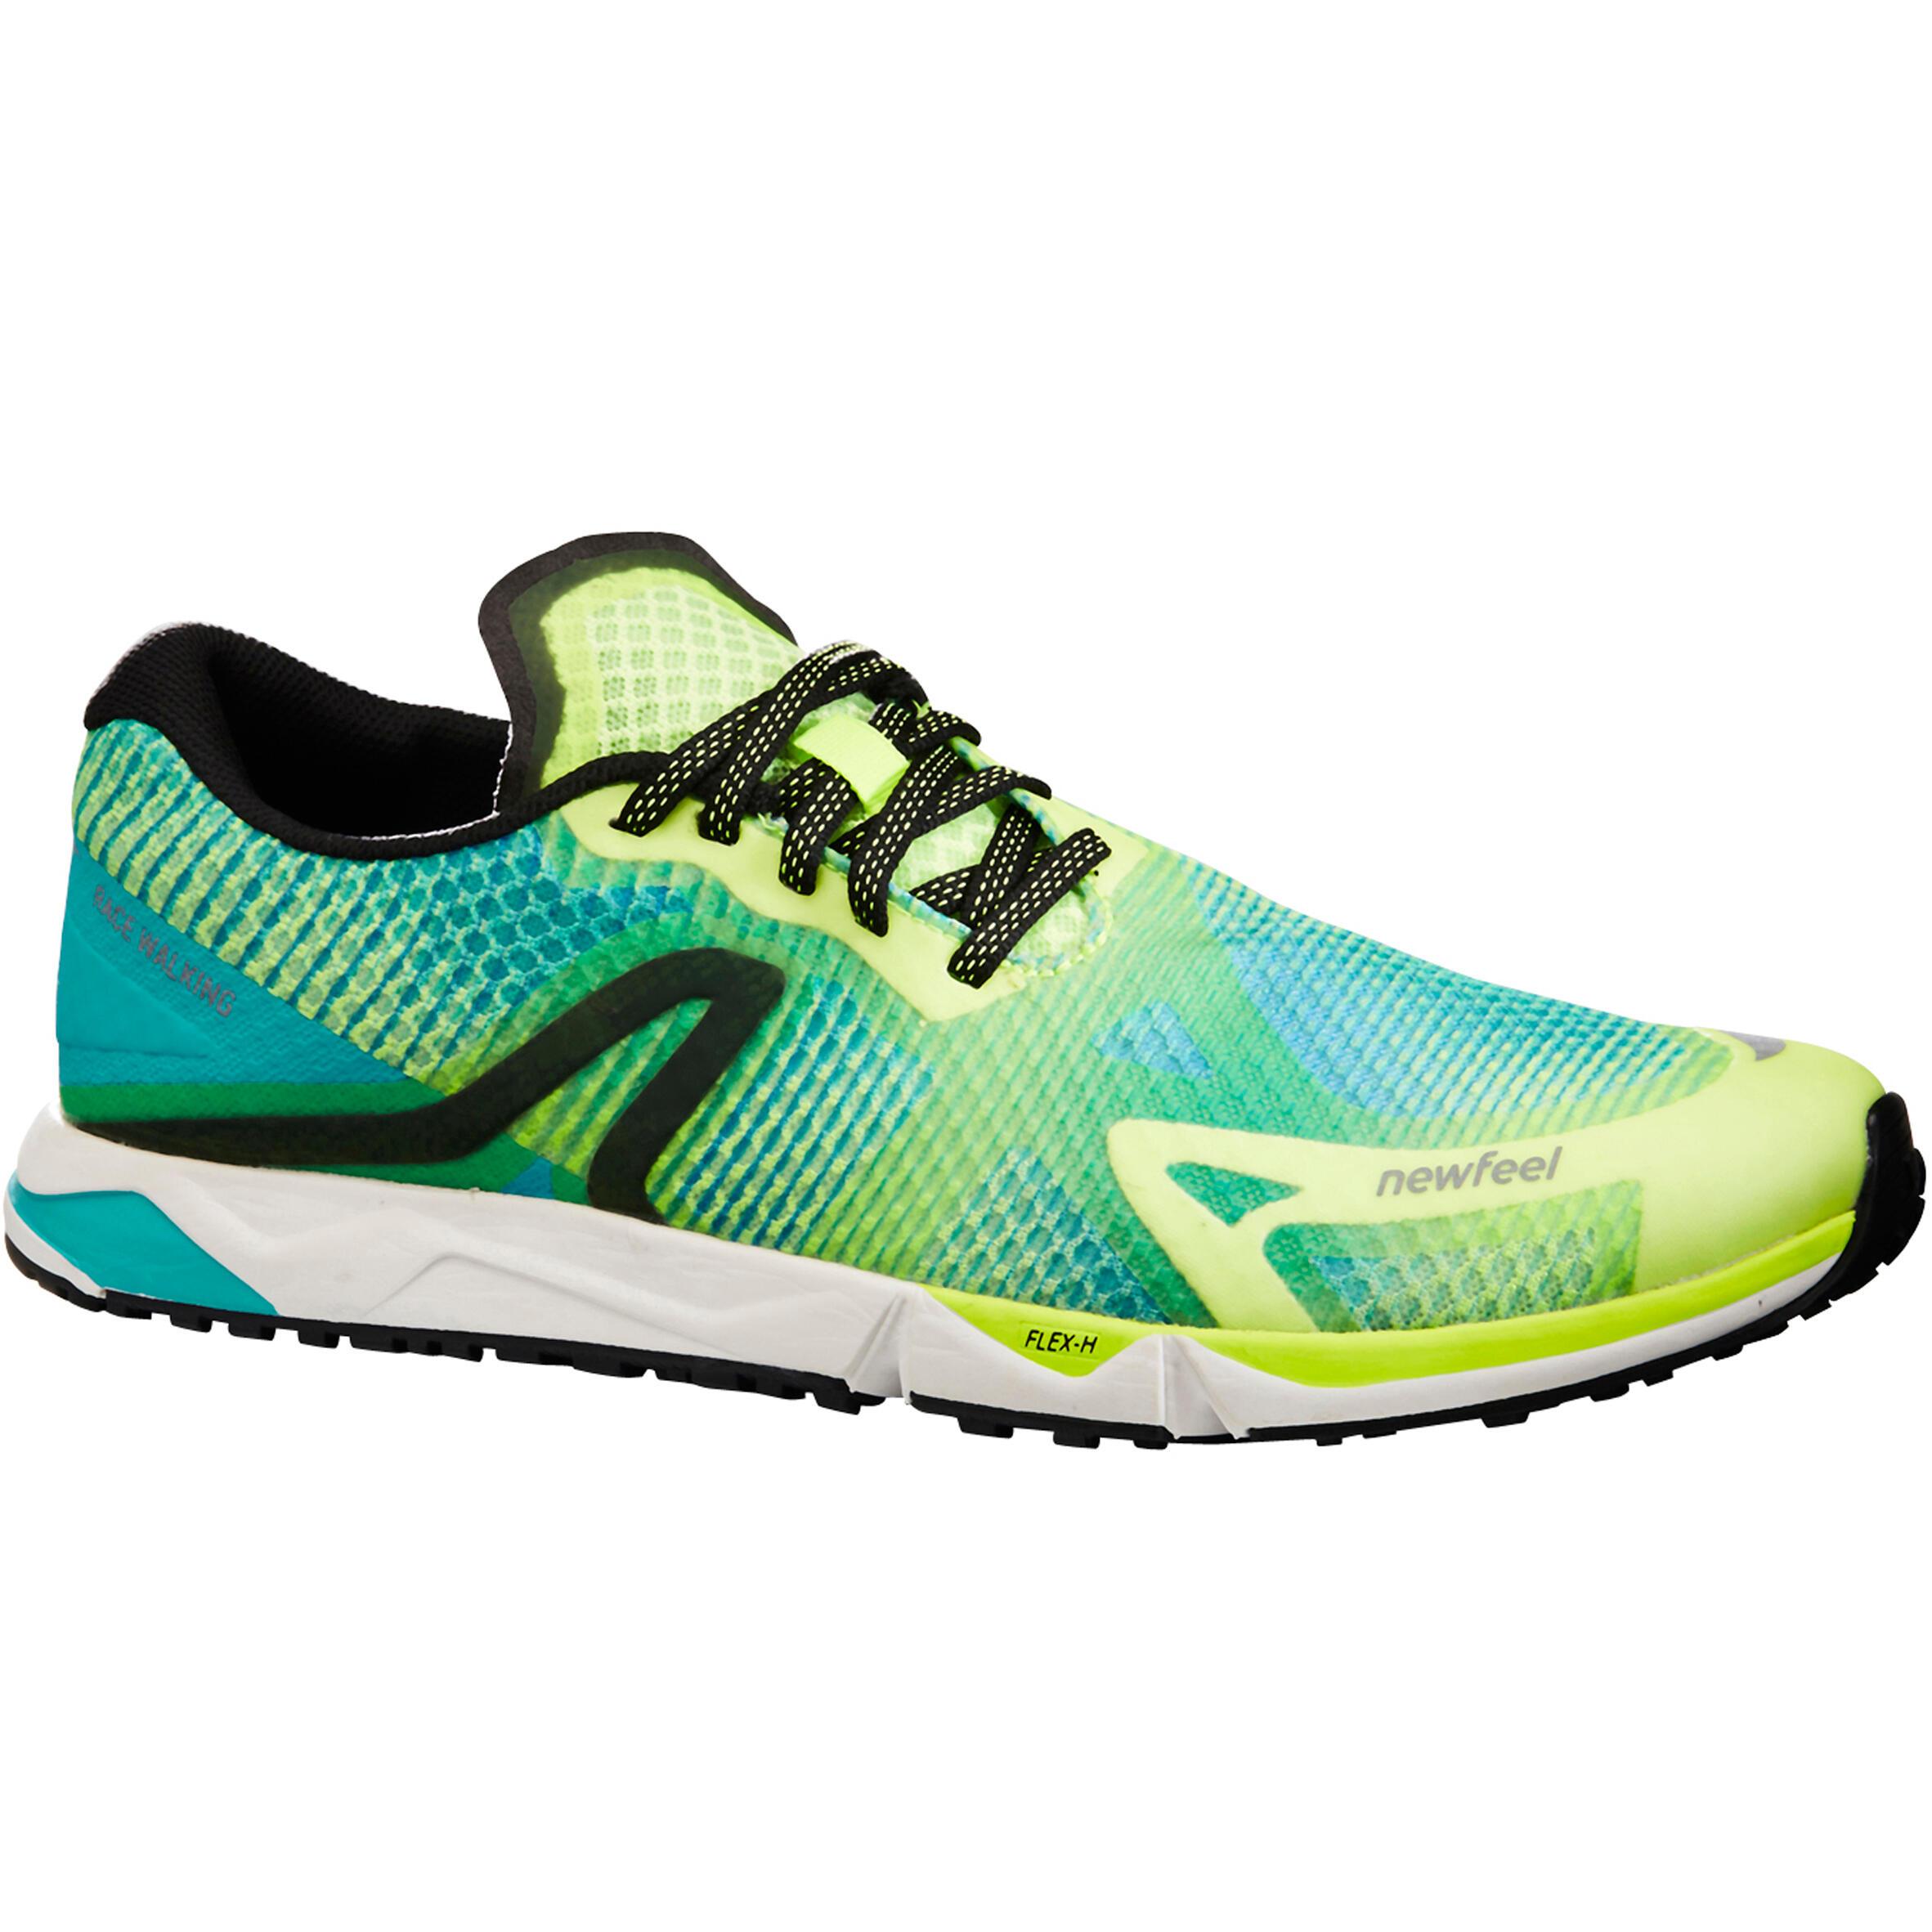 Walkingschuhe Athletisches Gehen RW 900 gelb/blau | Schuhe > Sportschuhe > Walkingschuhe | Newfeel